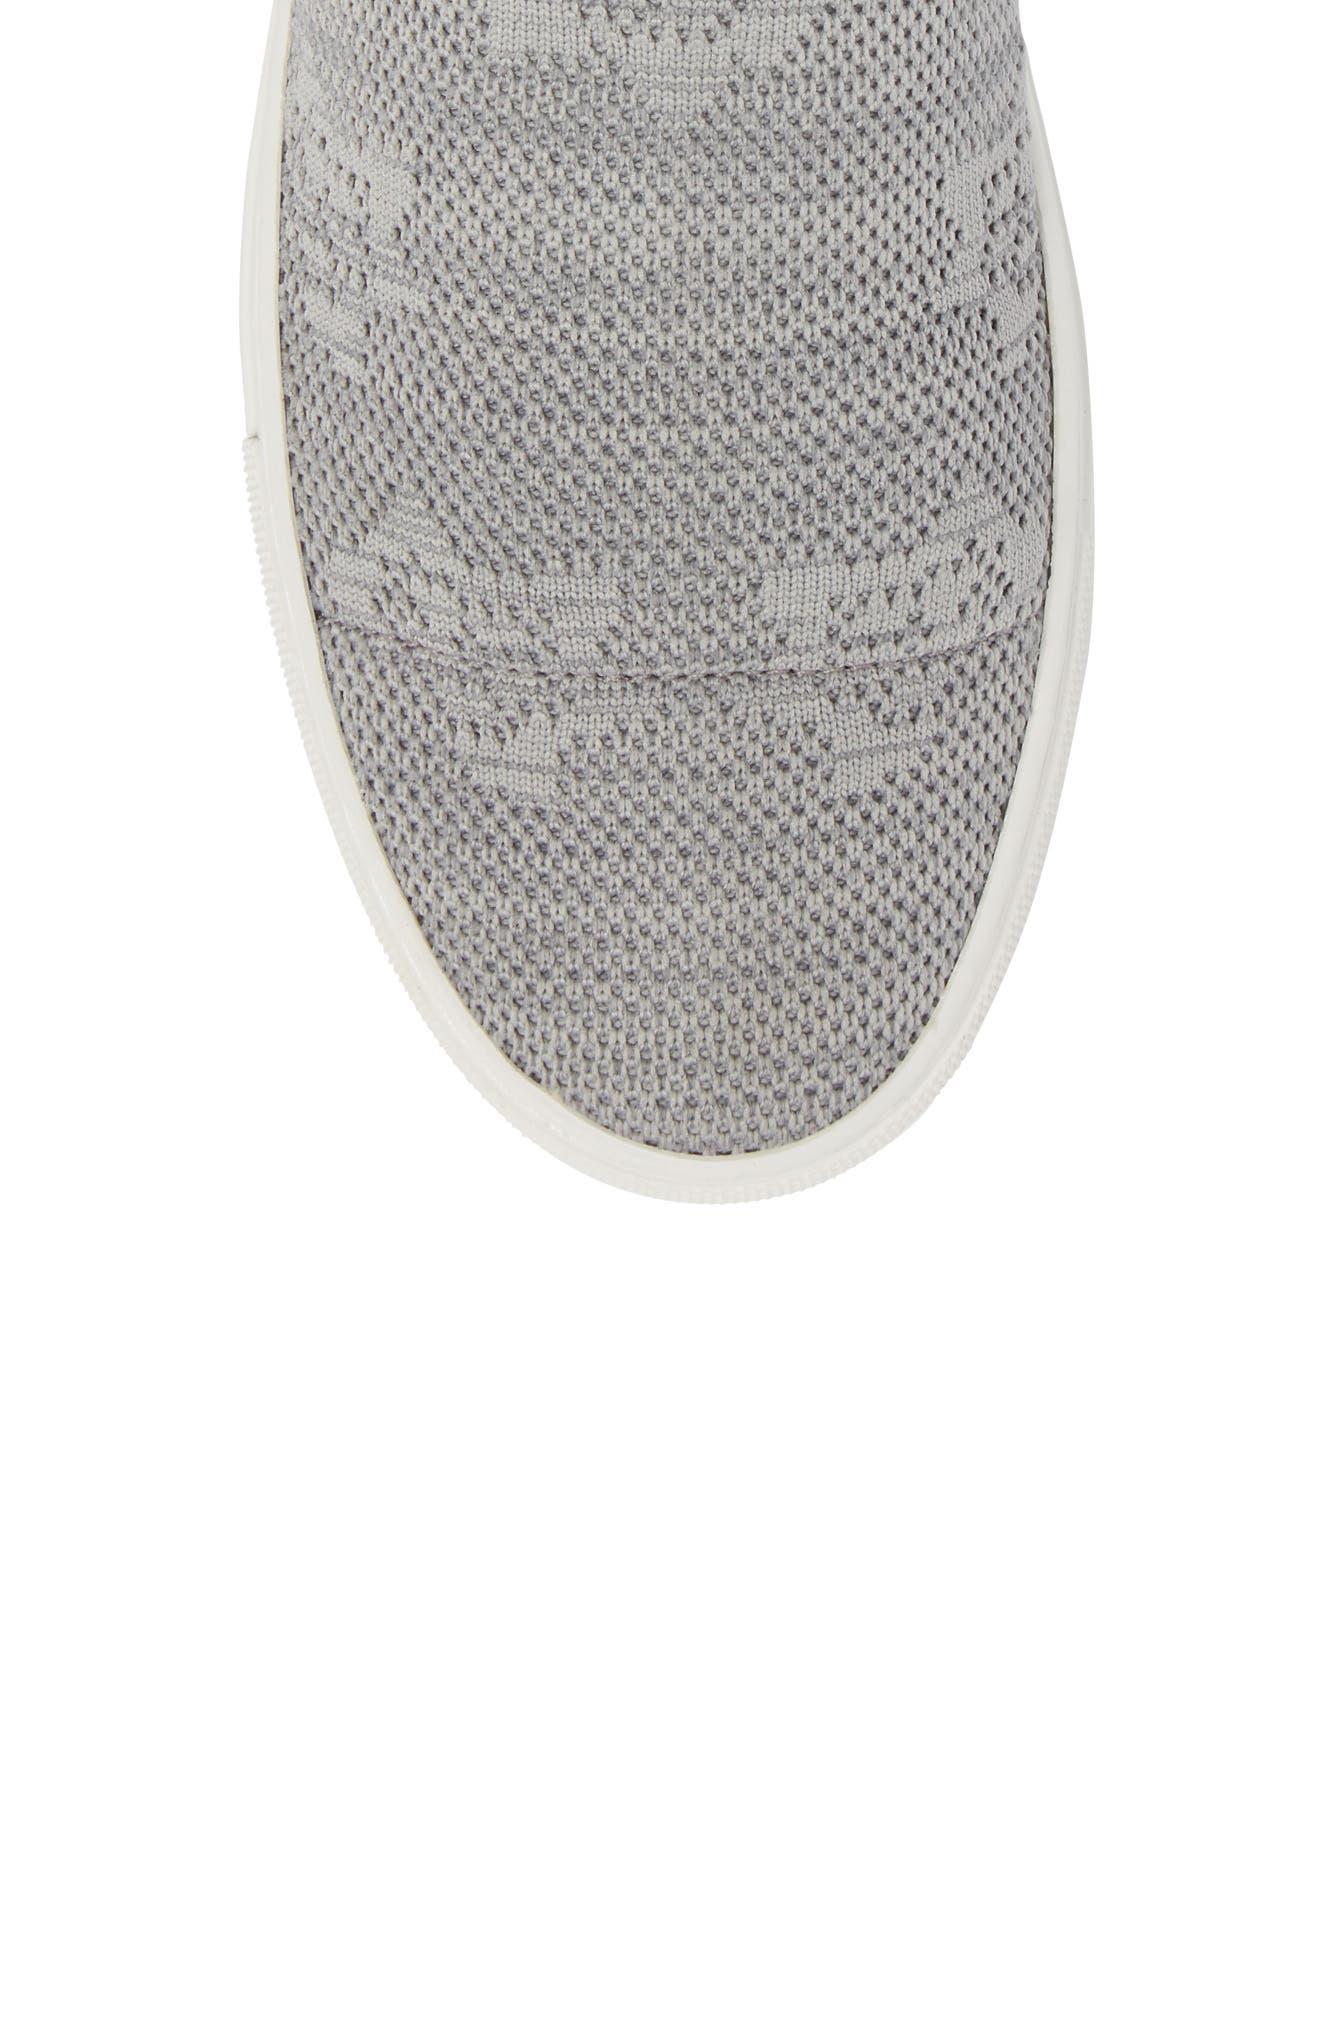 Keating Sneaker,                             Alternate thumbnail 5, color,                             Dust Grey Fabric